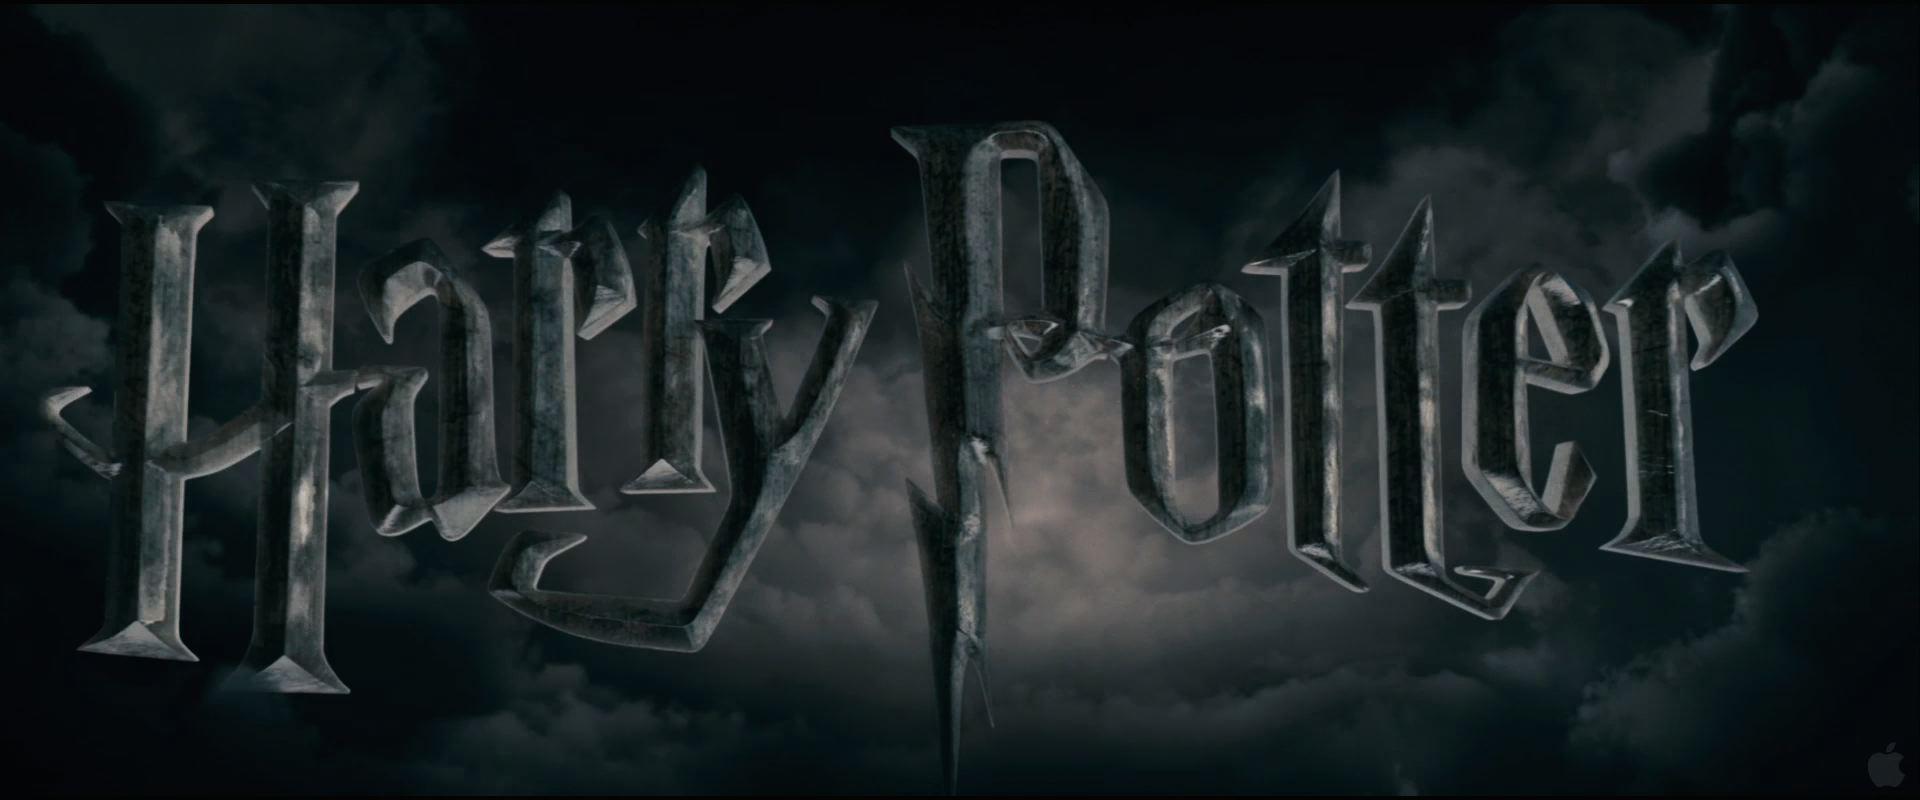 http://www.zickma.fr/wp-content/uploads/2015/08/Harry-Potter-logo.jpg